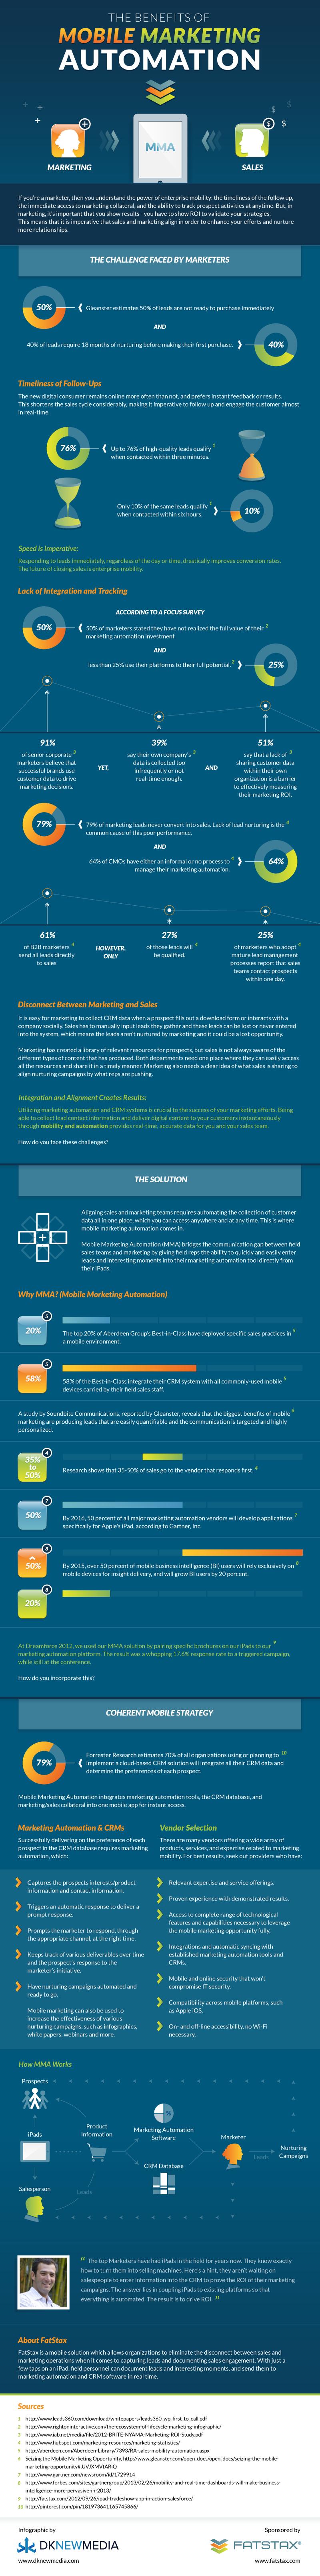 benefits-of-mobile-marketing-automation_51858ca85604e